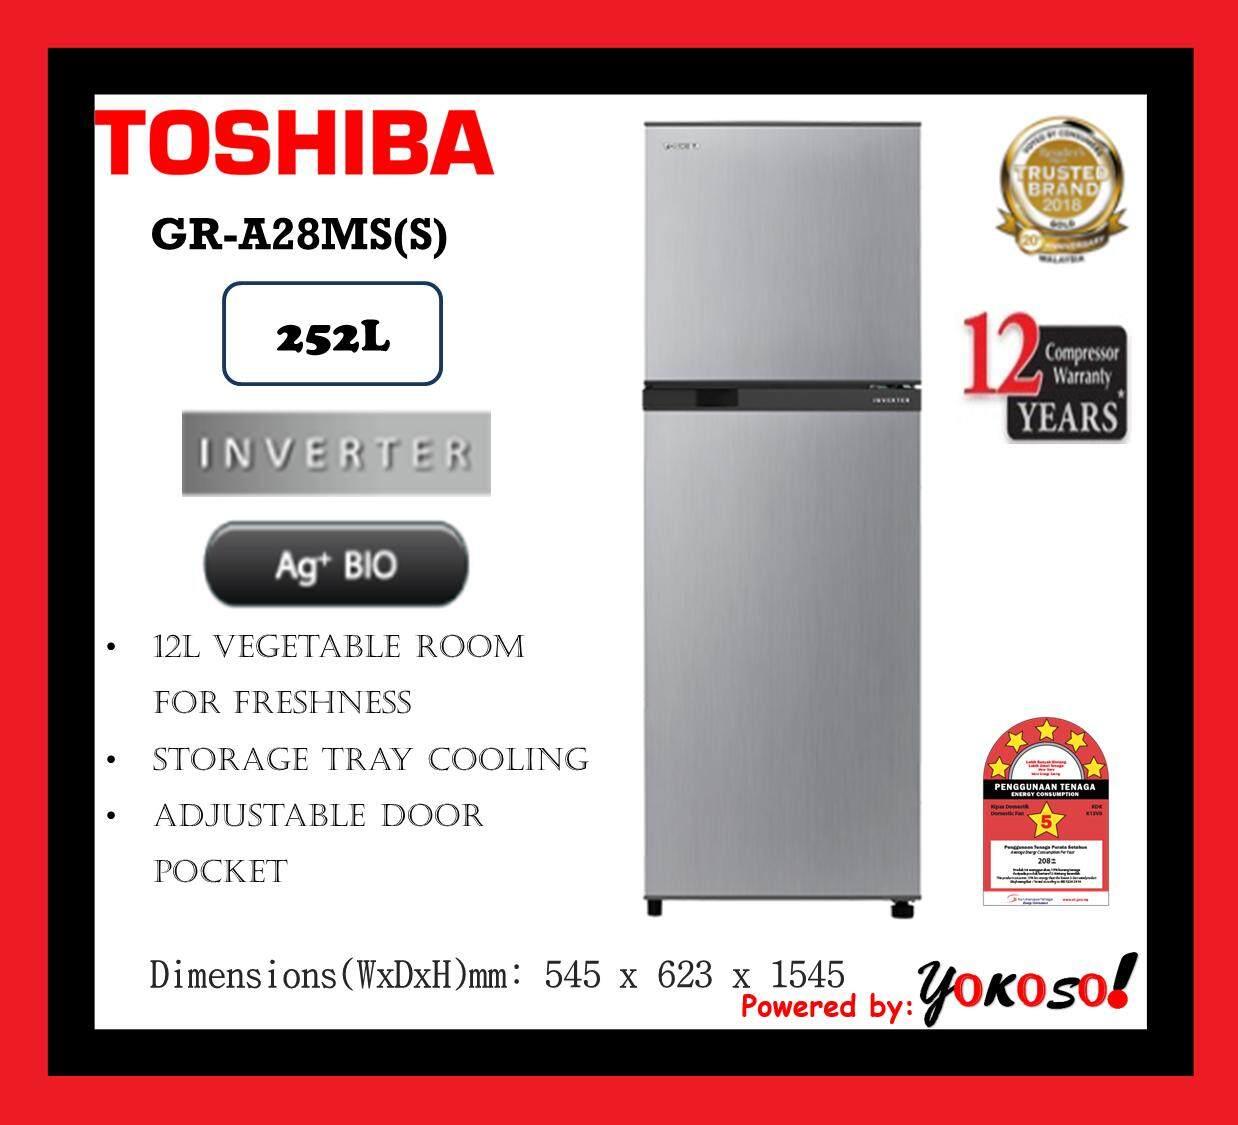 Toshiba GR-A28MS(S) 252L 2 Doors Inverter Fridge Refrigerator - Ag+ Bio Deodorizer (Silver)